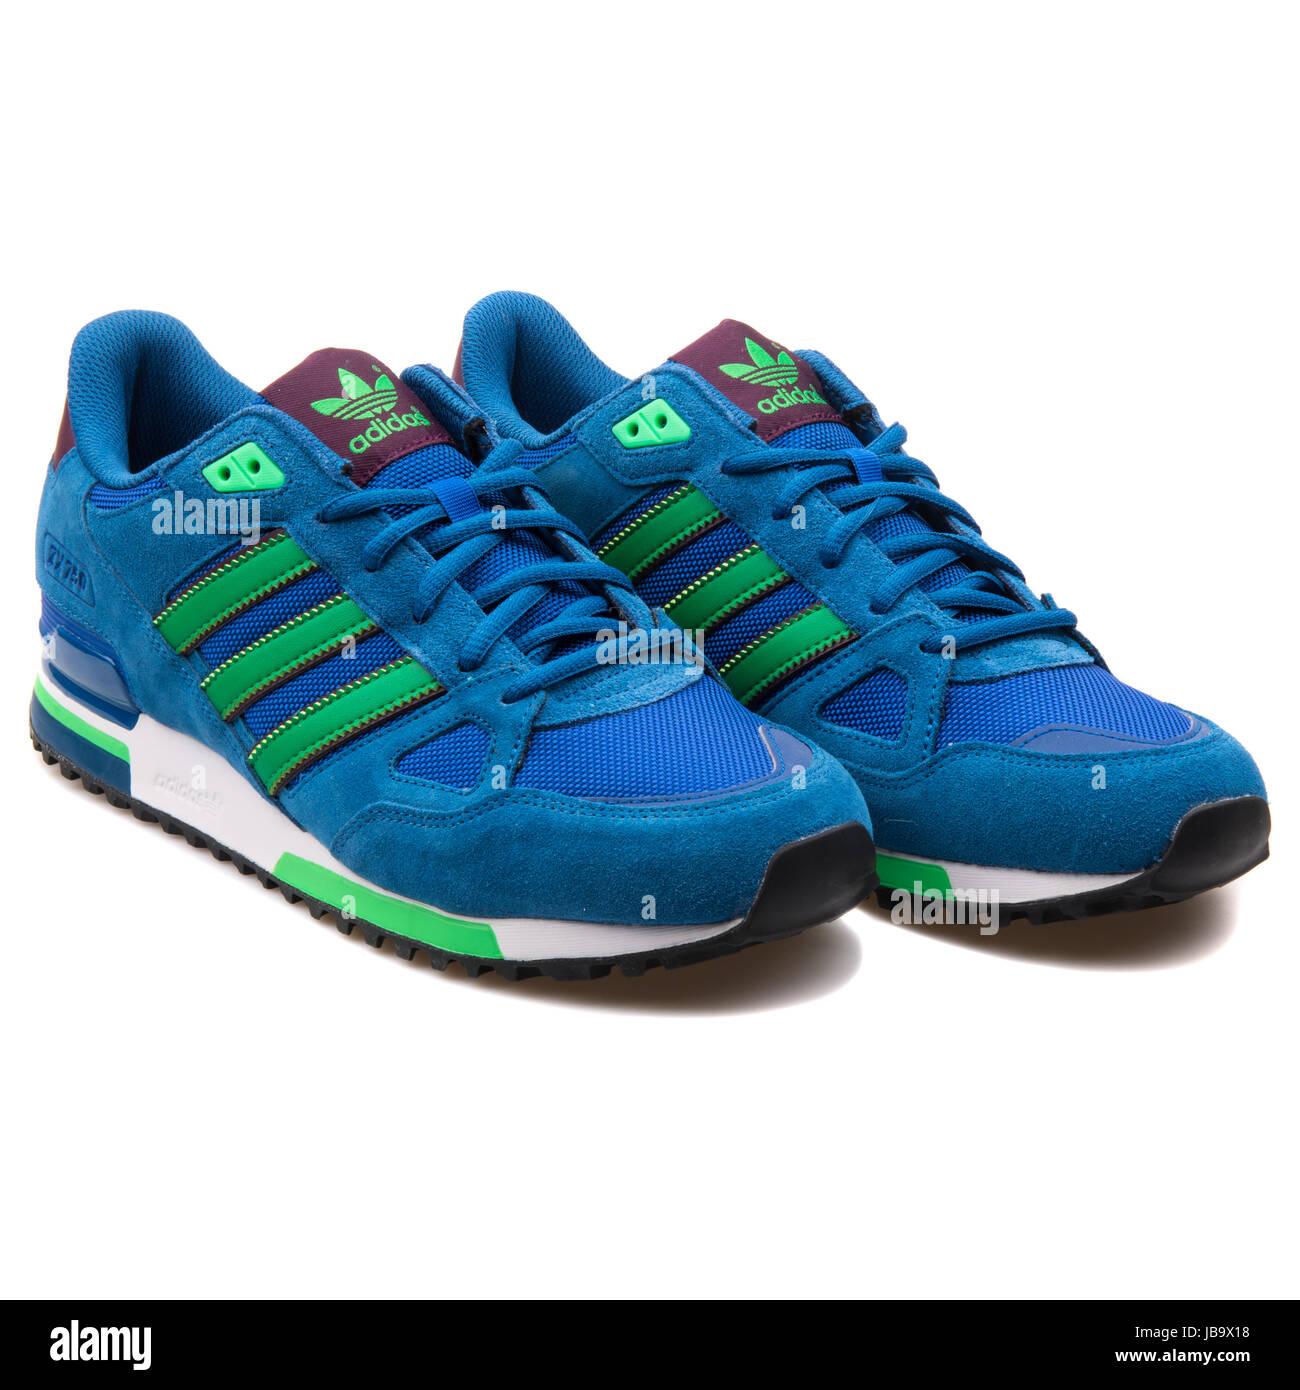 adidas zx verde militare